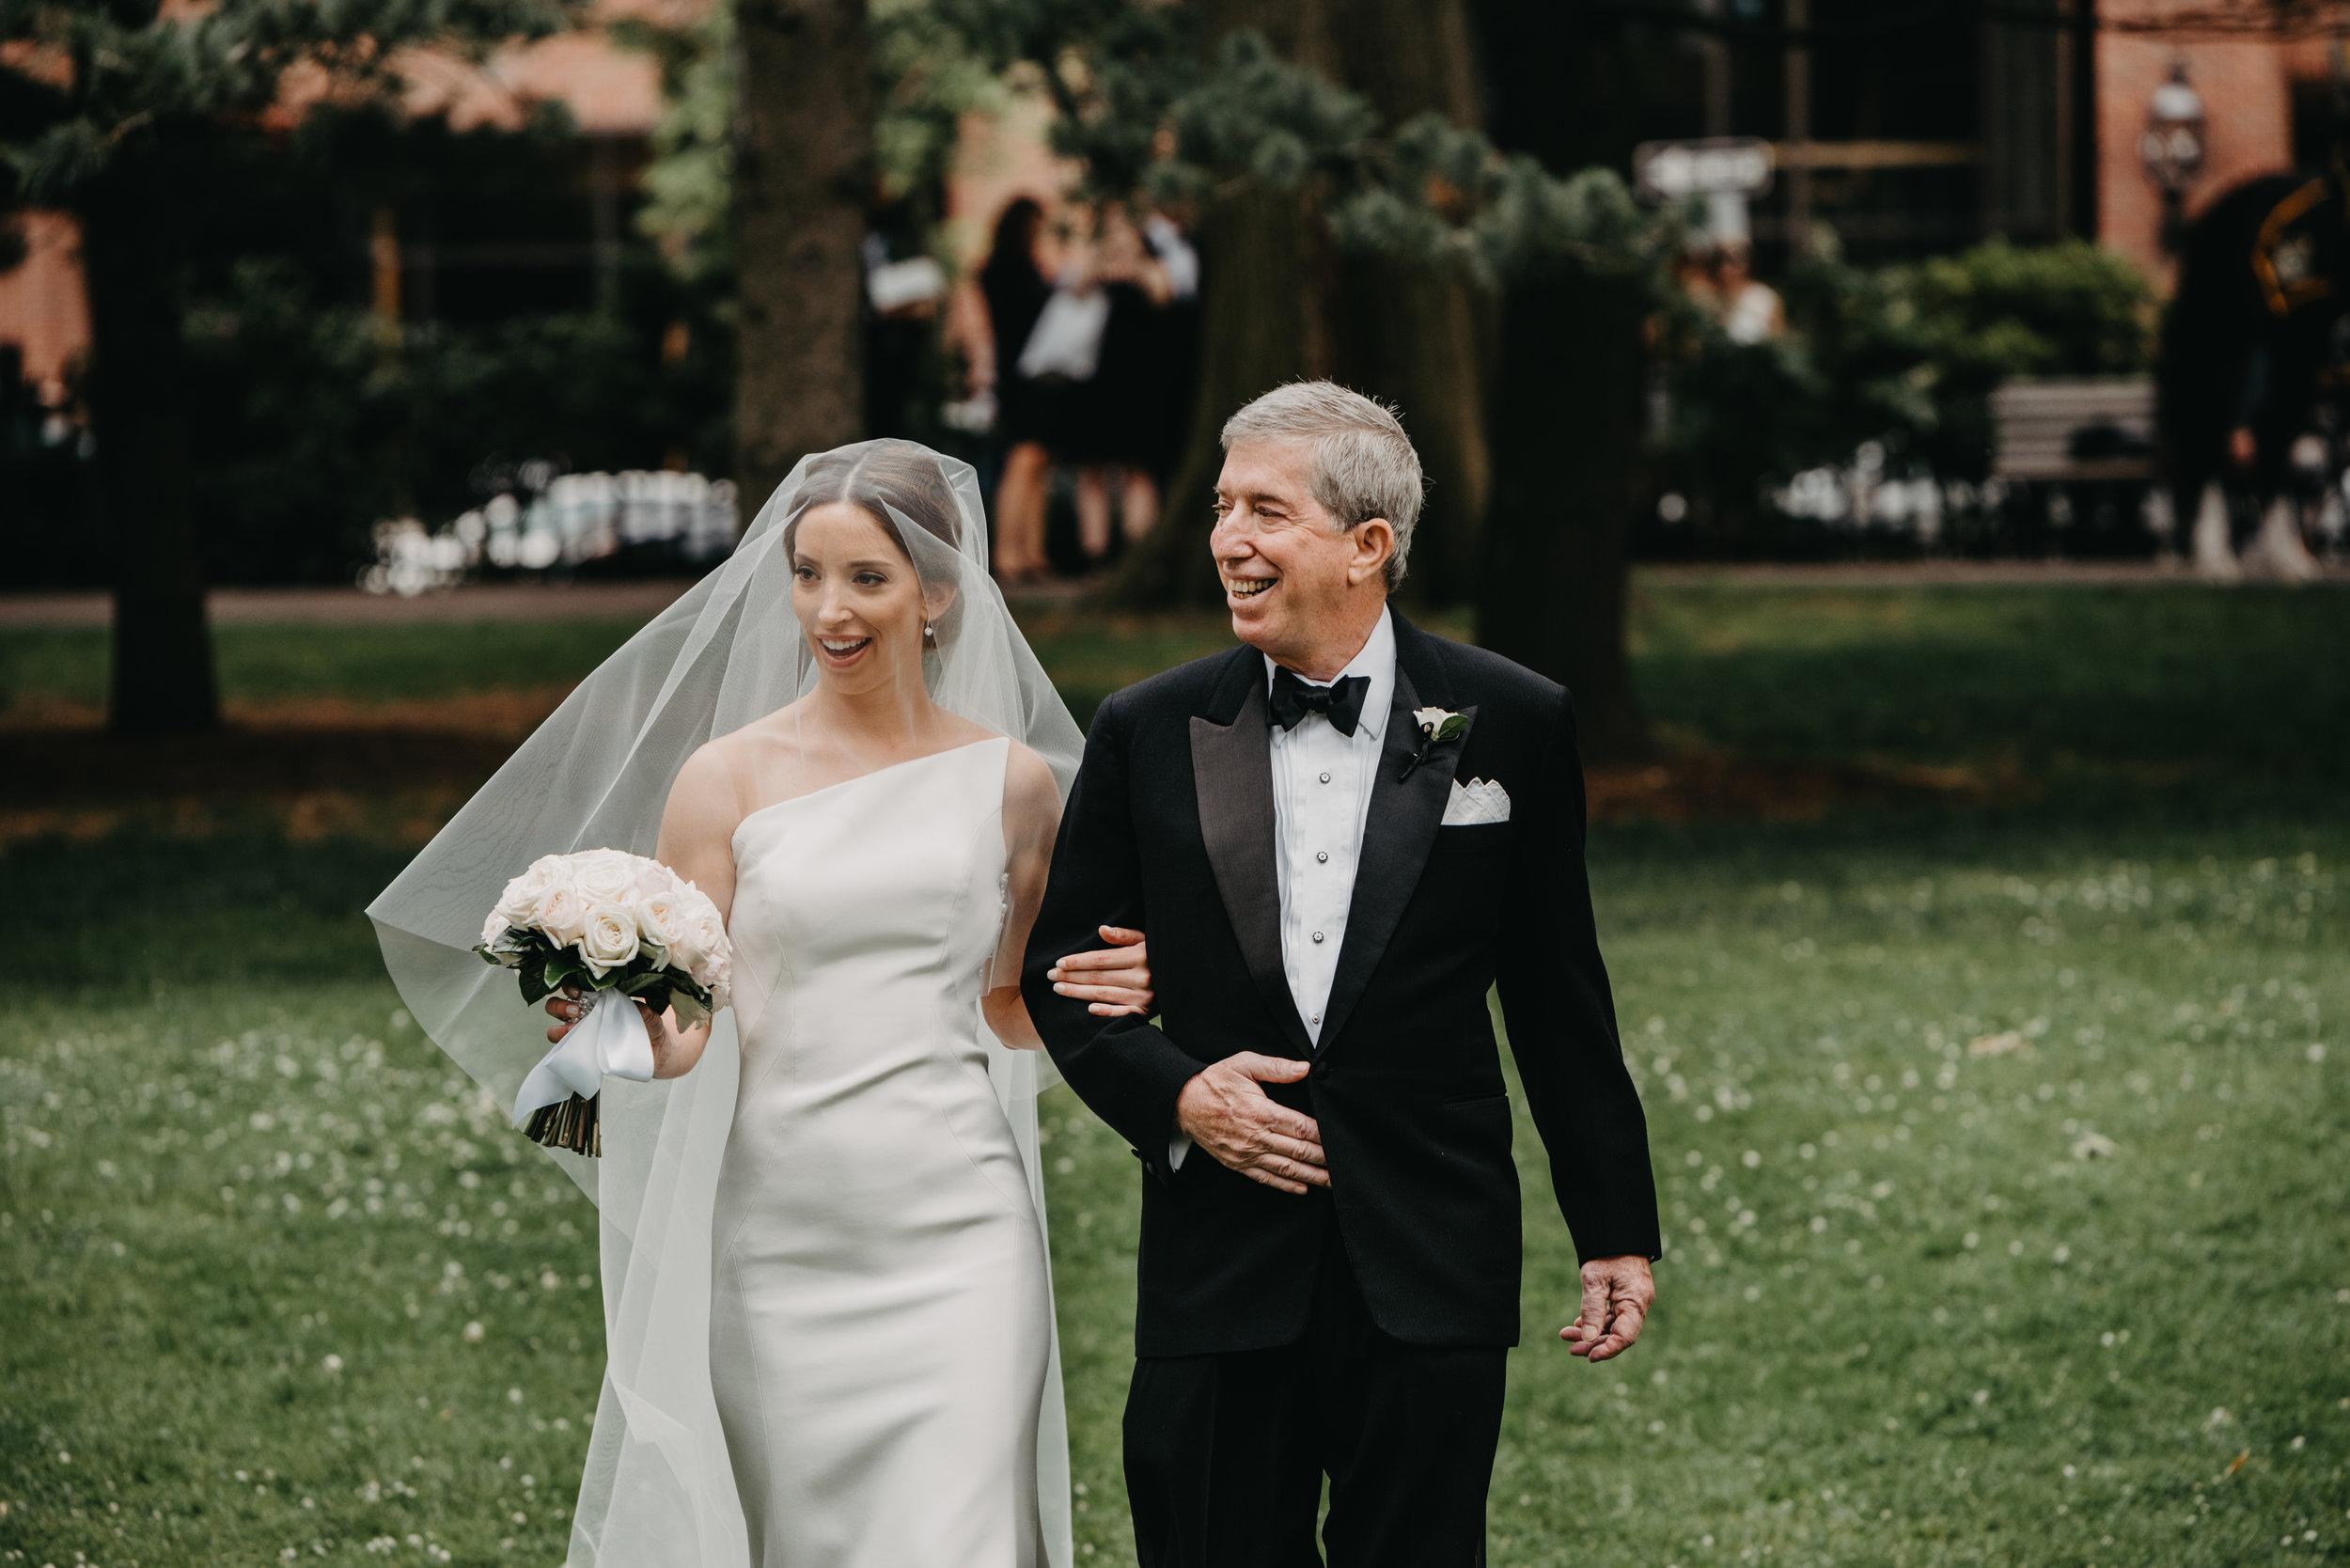 BOSTON PUBLIC GARDEN WEDDING, GARDEN WEDDING, BOSTON WEDDING PLANNER, NICOLE SIMERAL, FOUR SEASONS WEDDING, CLASSIC, TIMELESS, WEDDING WEDDING PLANNER, DESTINATION WEDDING, FATHER OF THE BRIDE